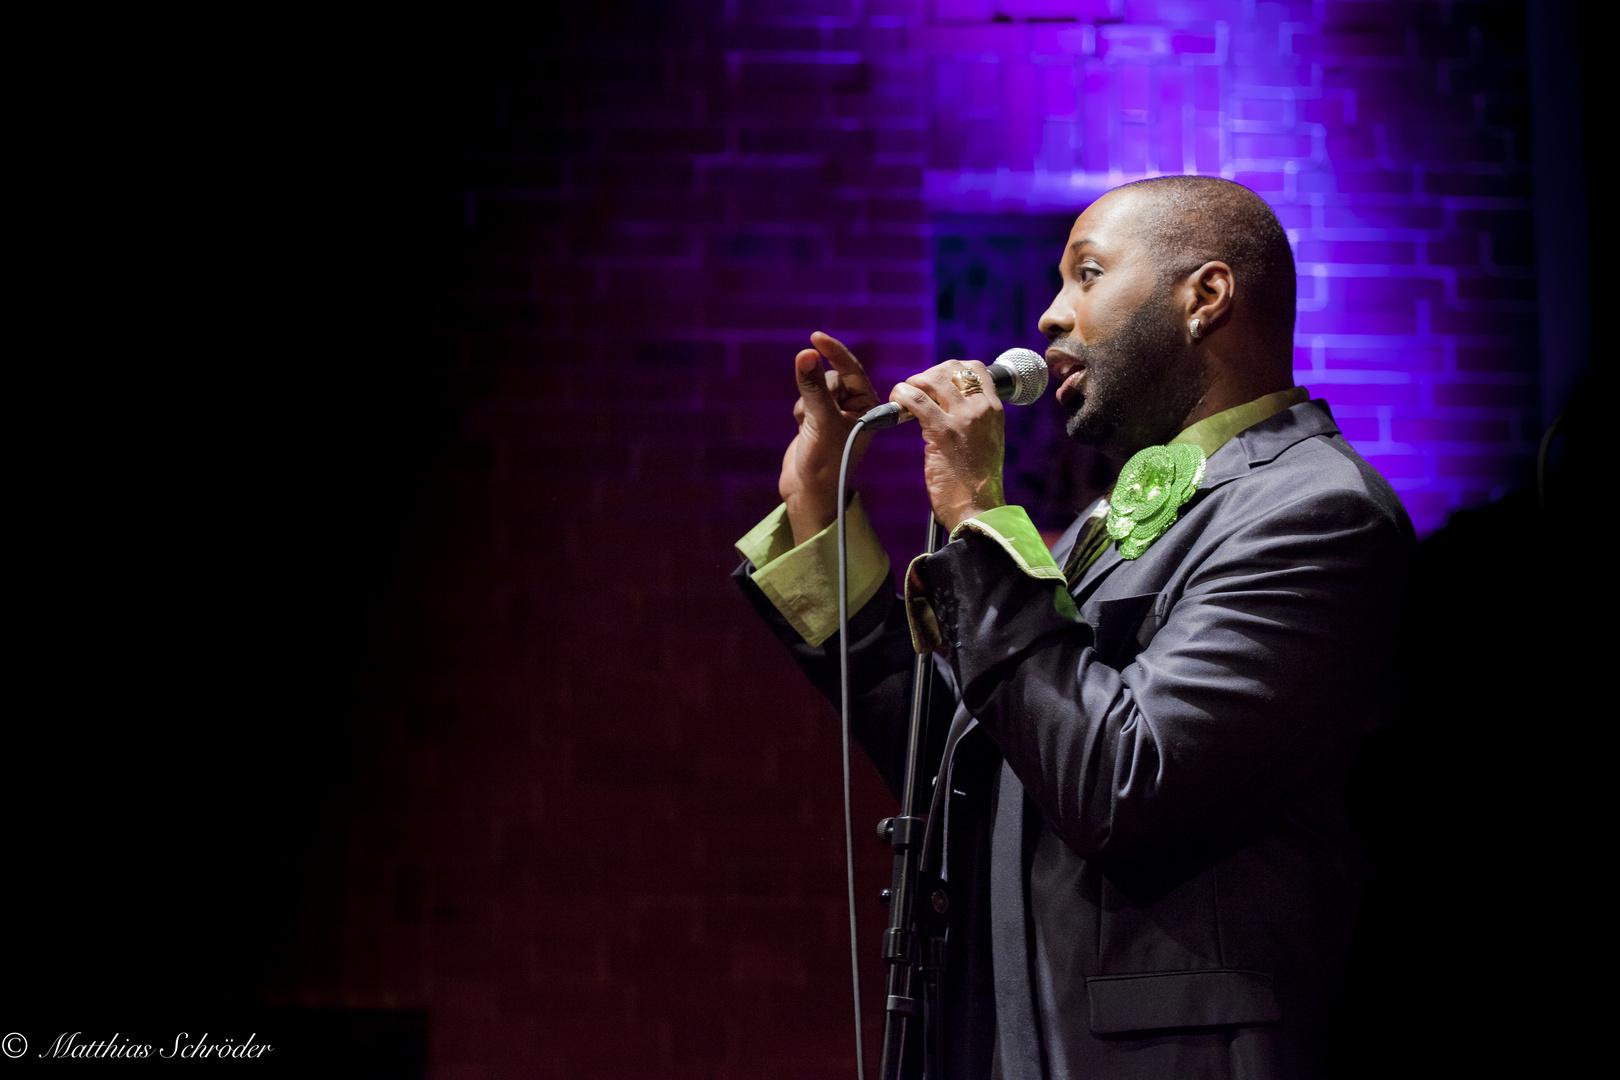 David. A Tobin - Singing